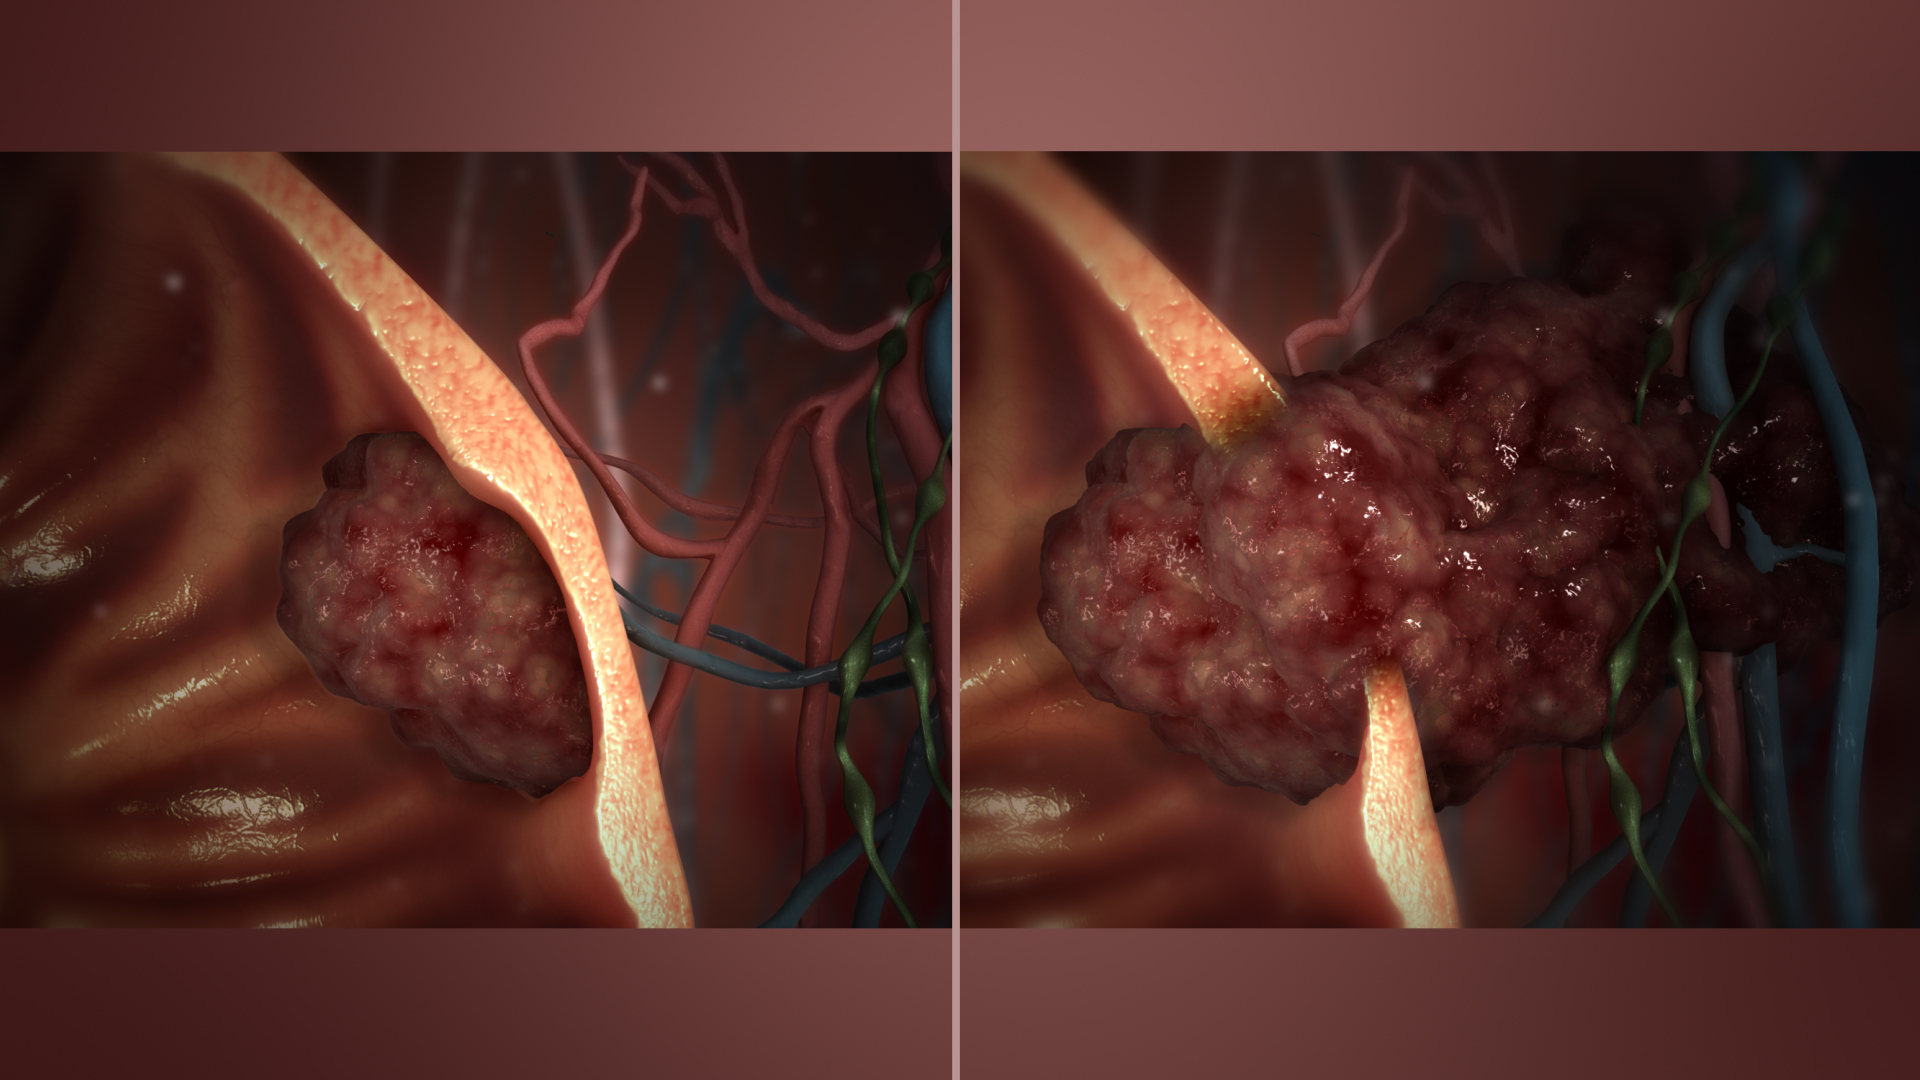 malignant neoplasm cancer condyloma acuminata genital warts